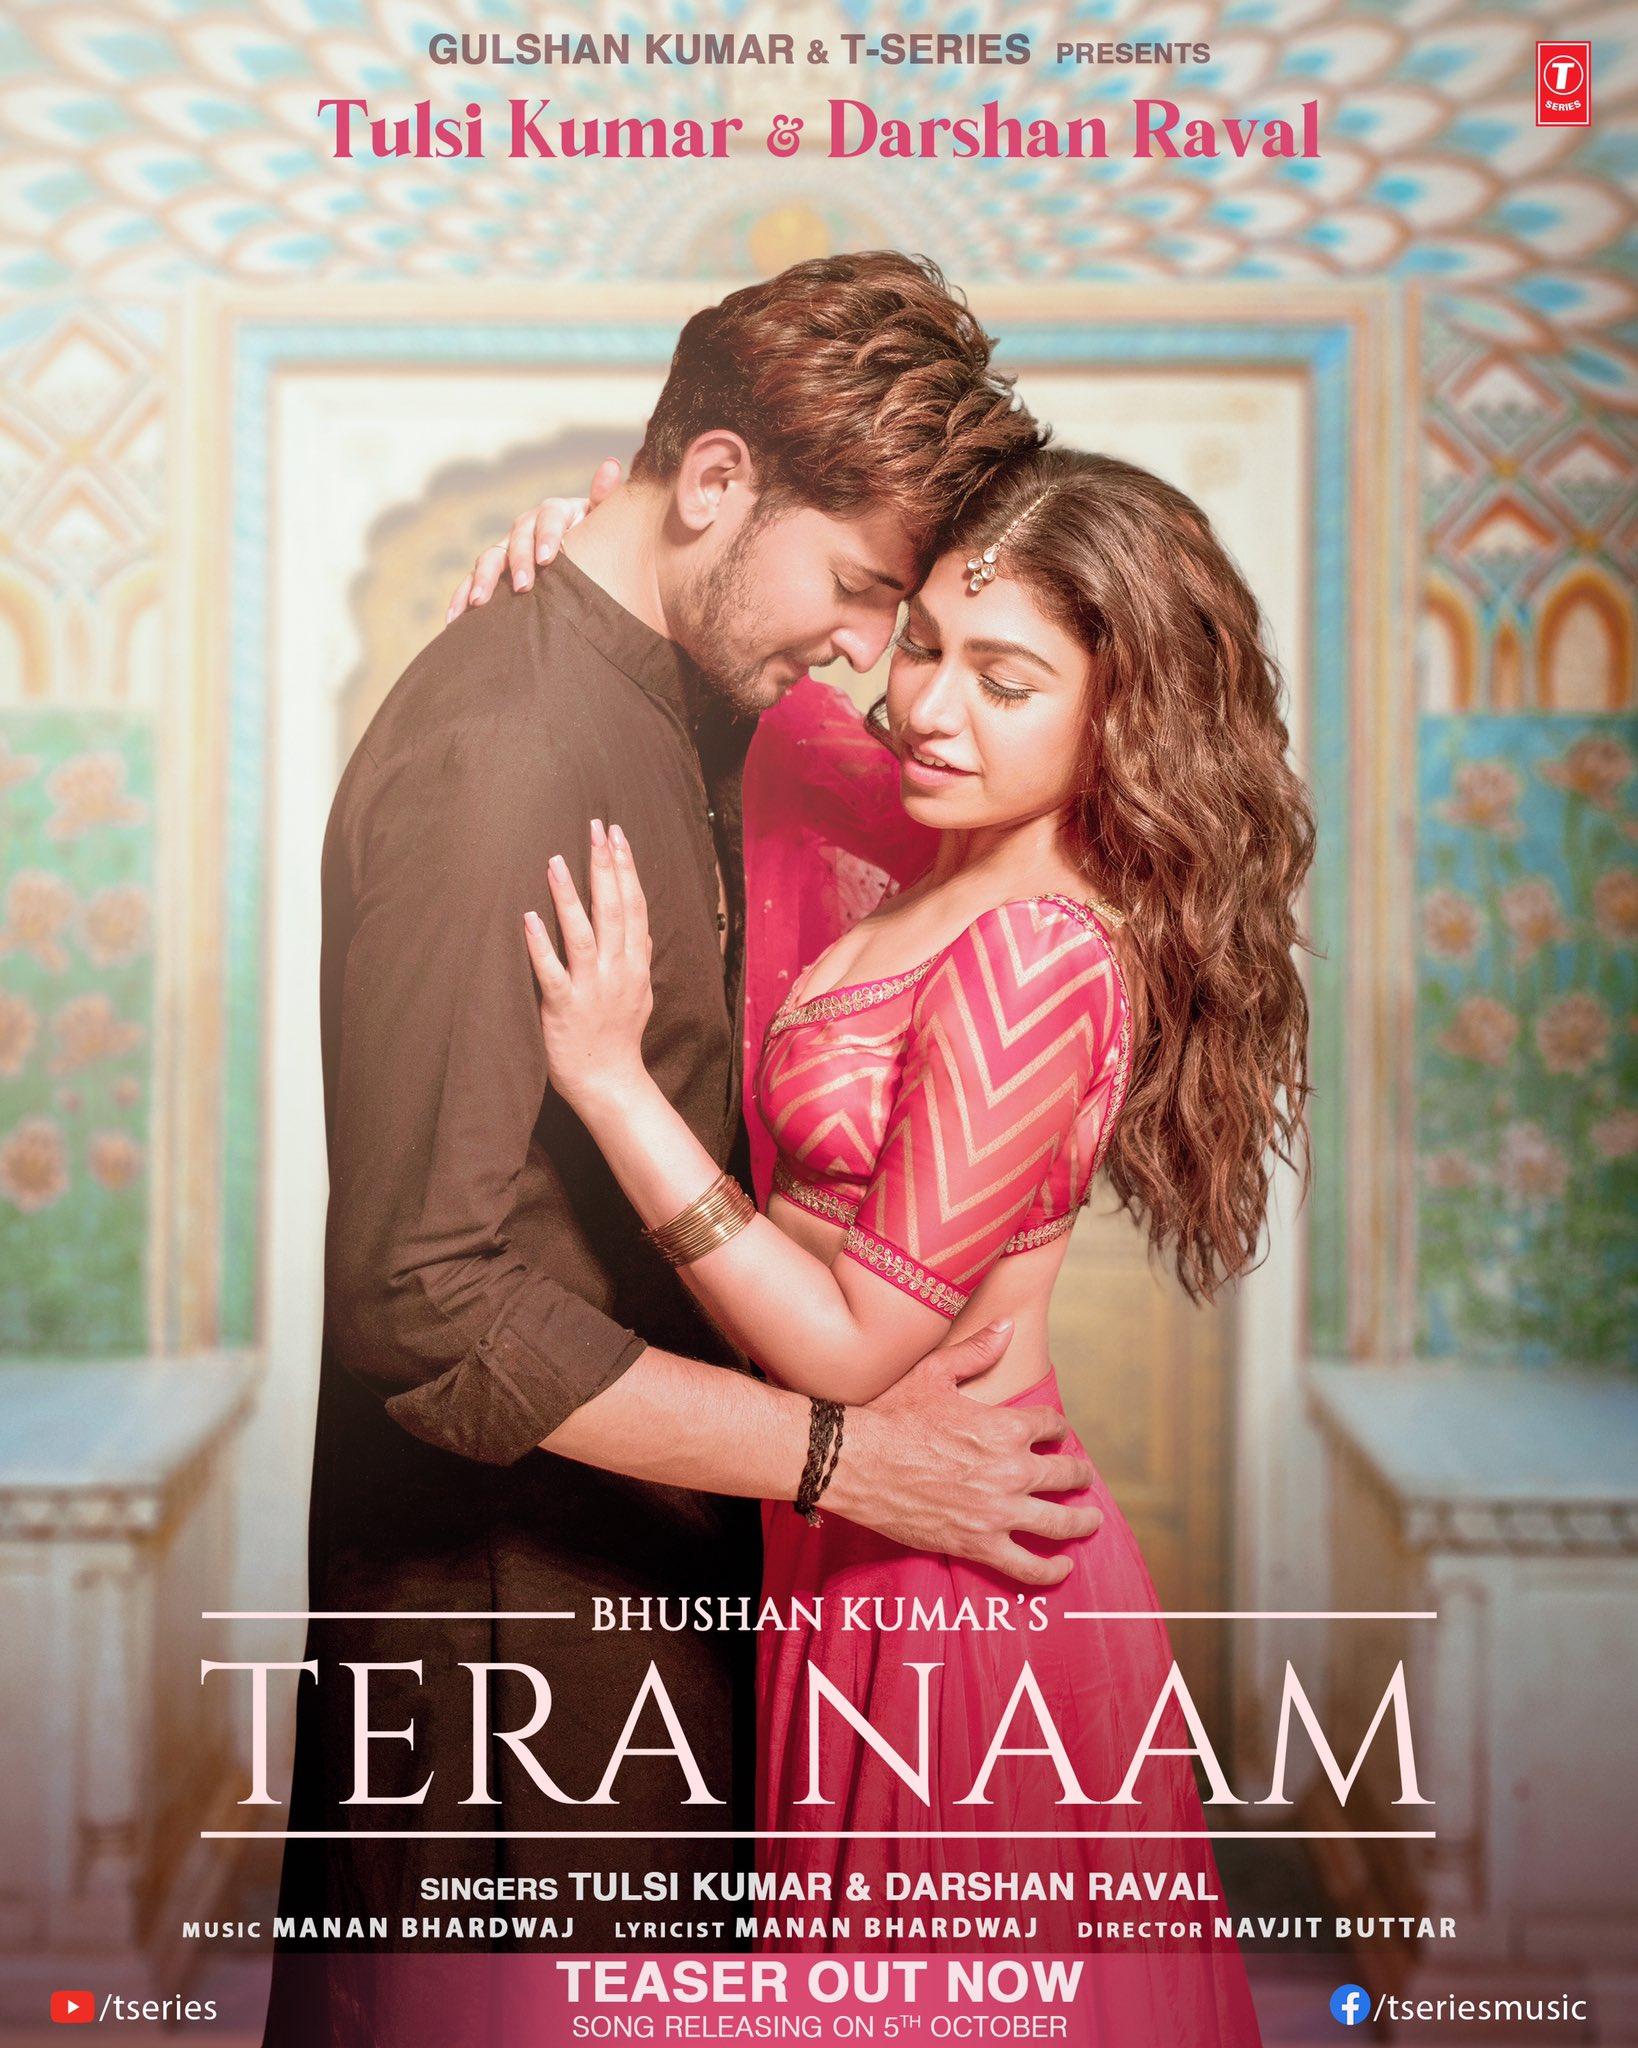 Tera Naam By Tulsi Kumar & Darshan Raval Official Music Video 1080p HDRip Download